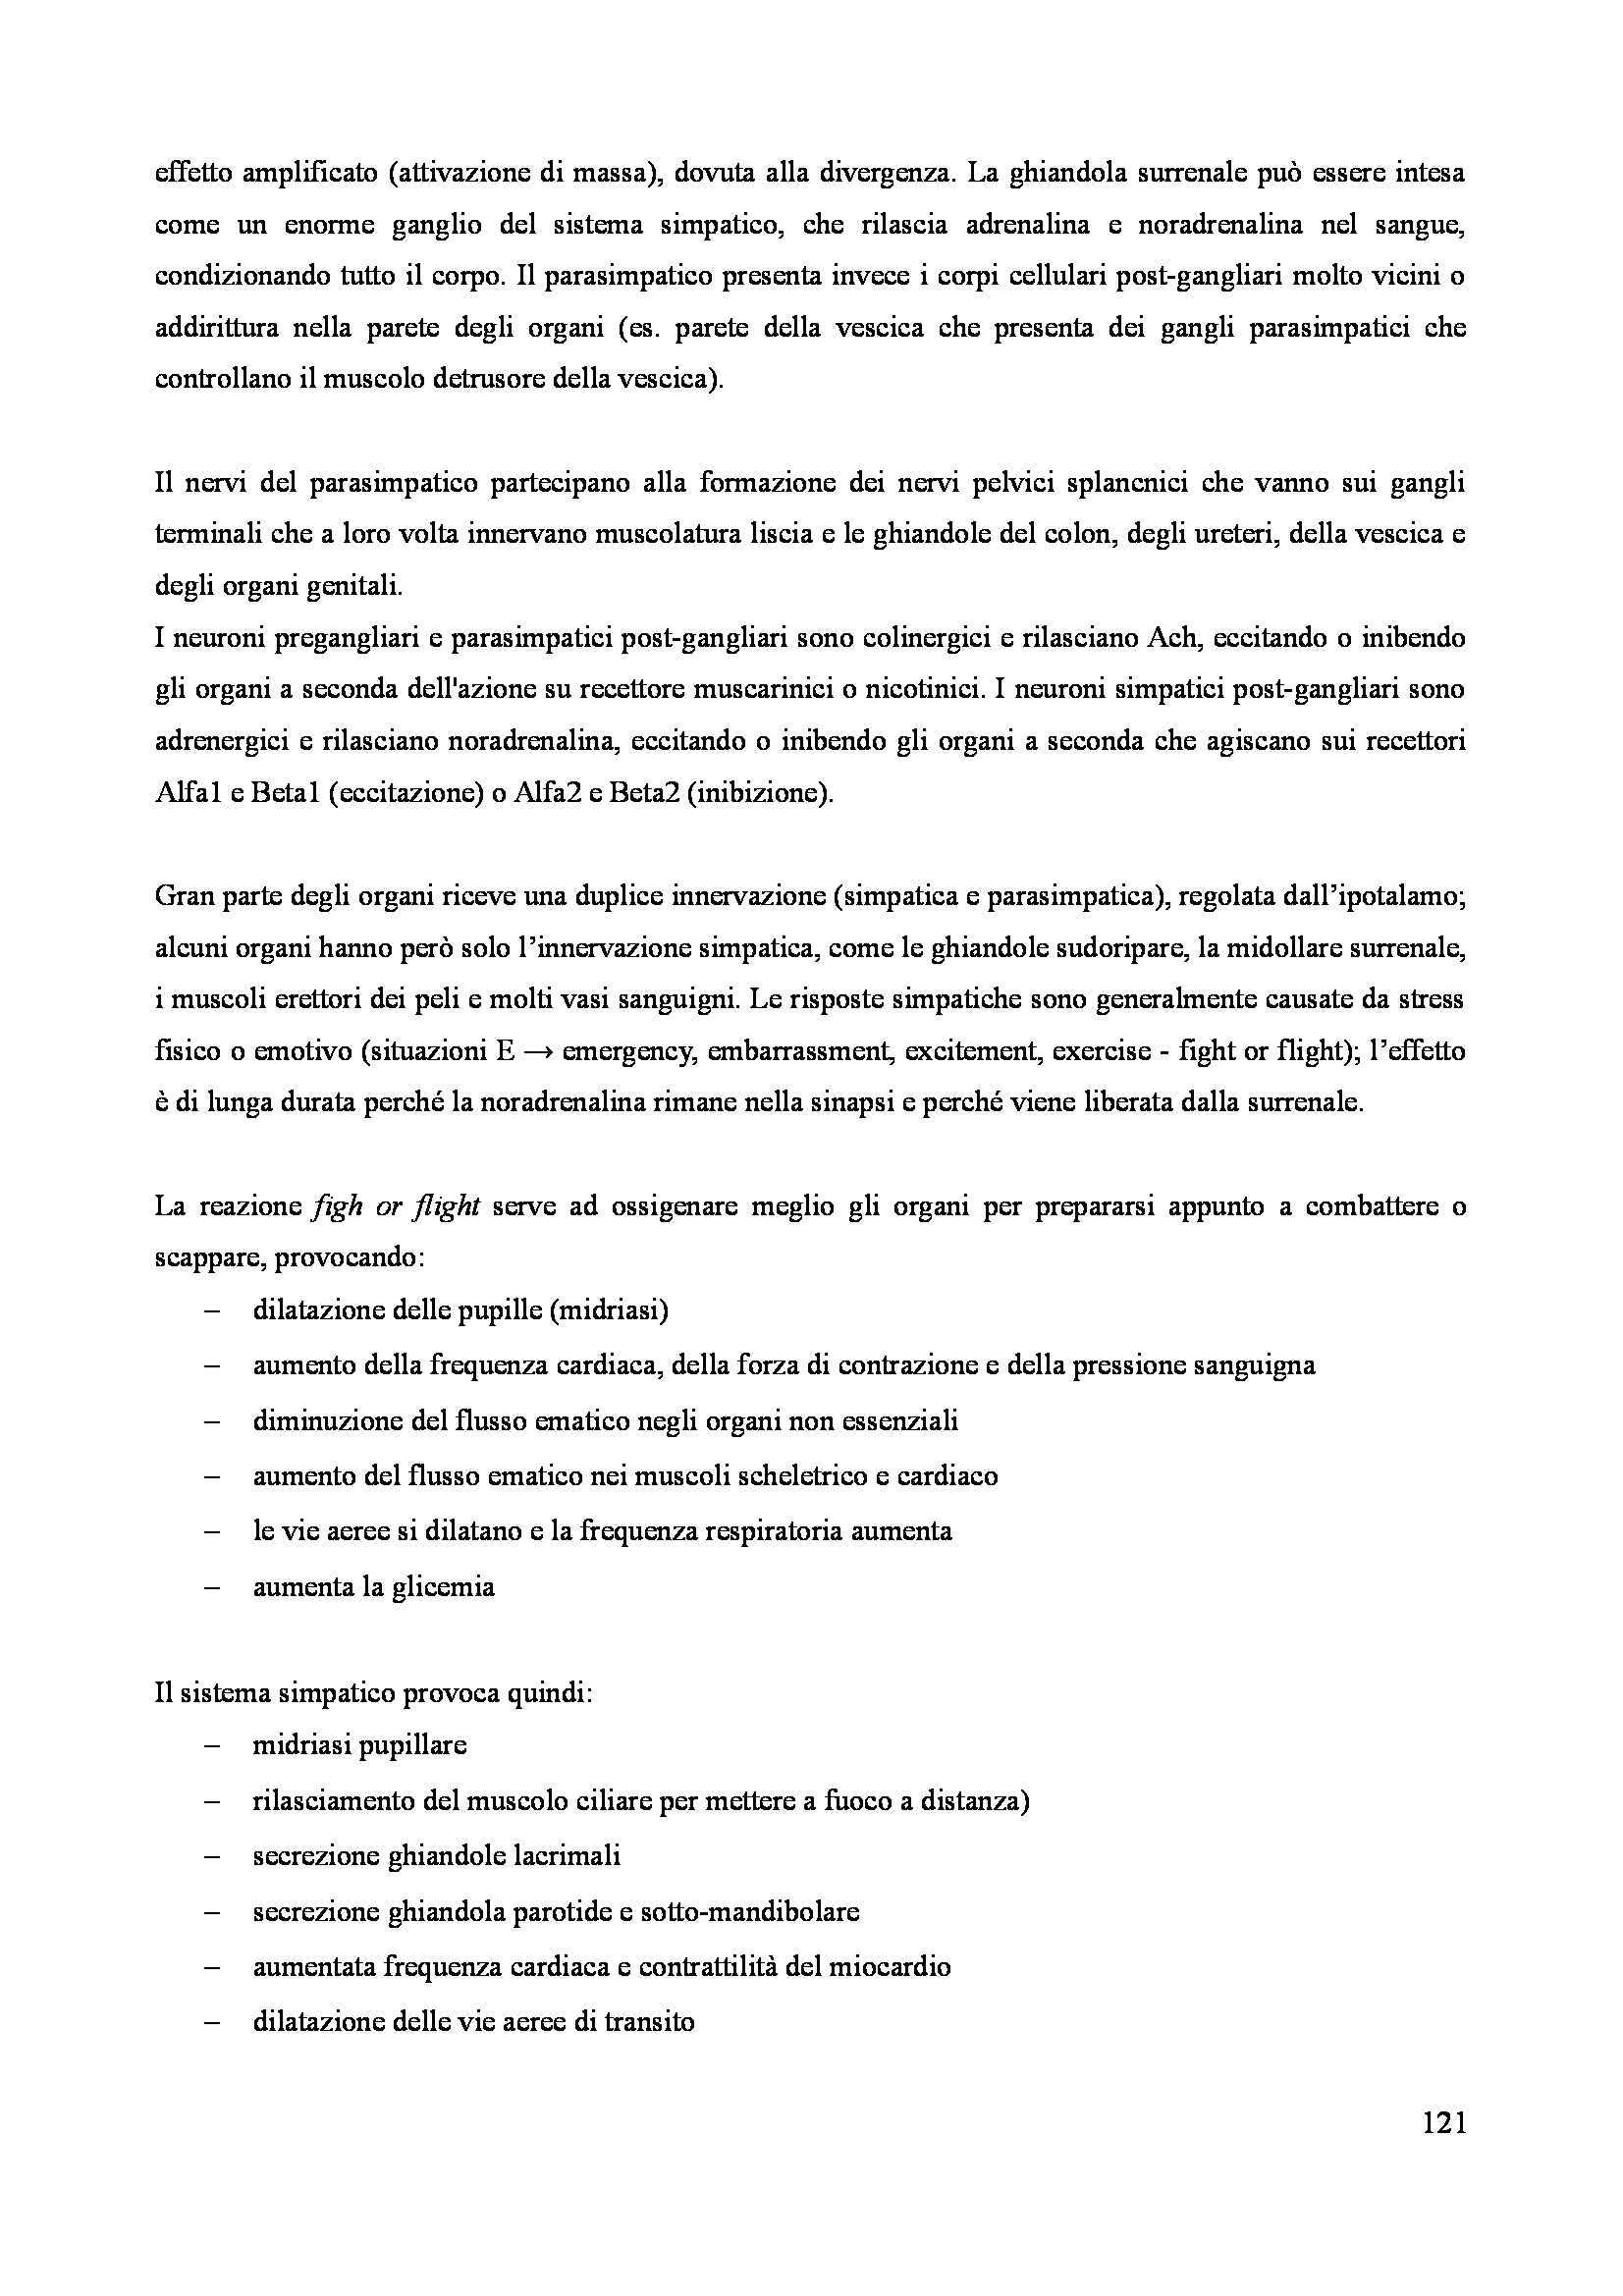 Neuroanatomia - Appunti Pag. 121